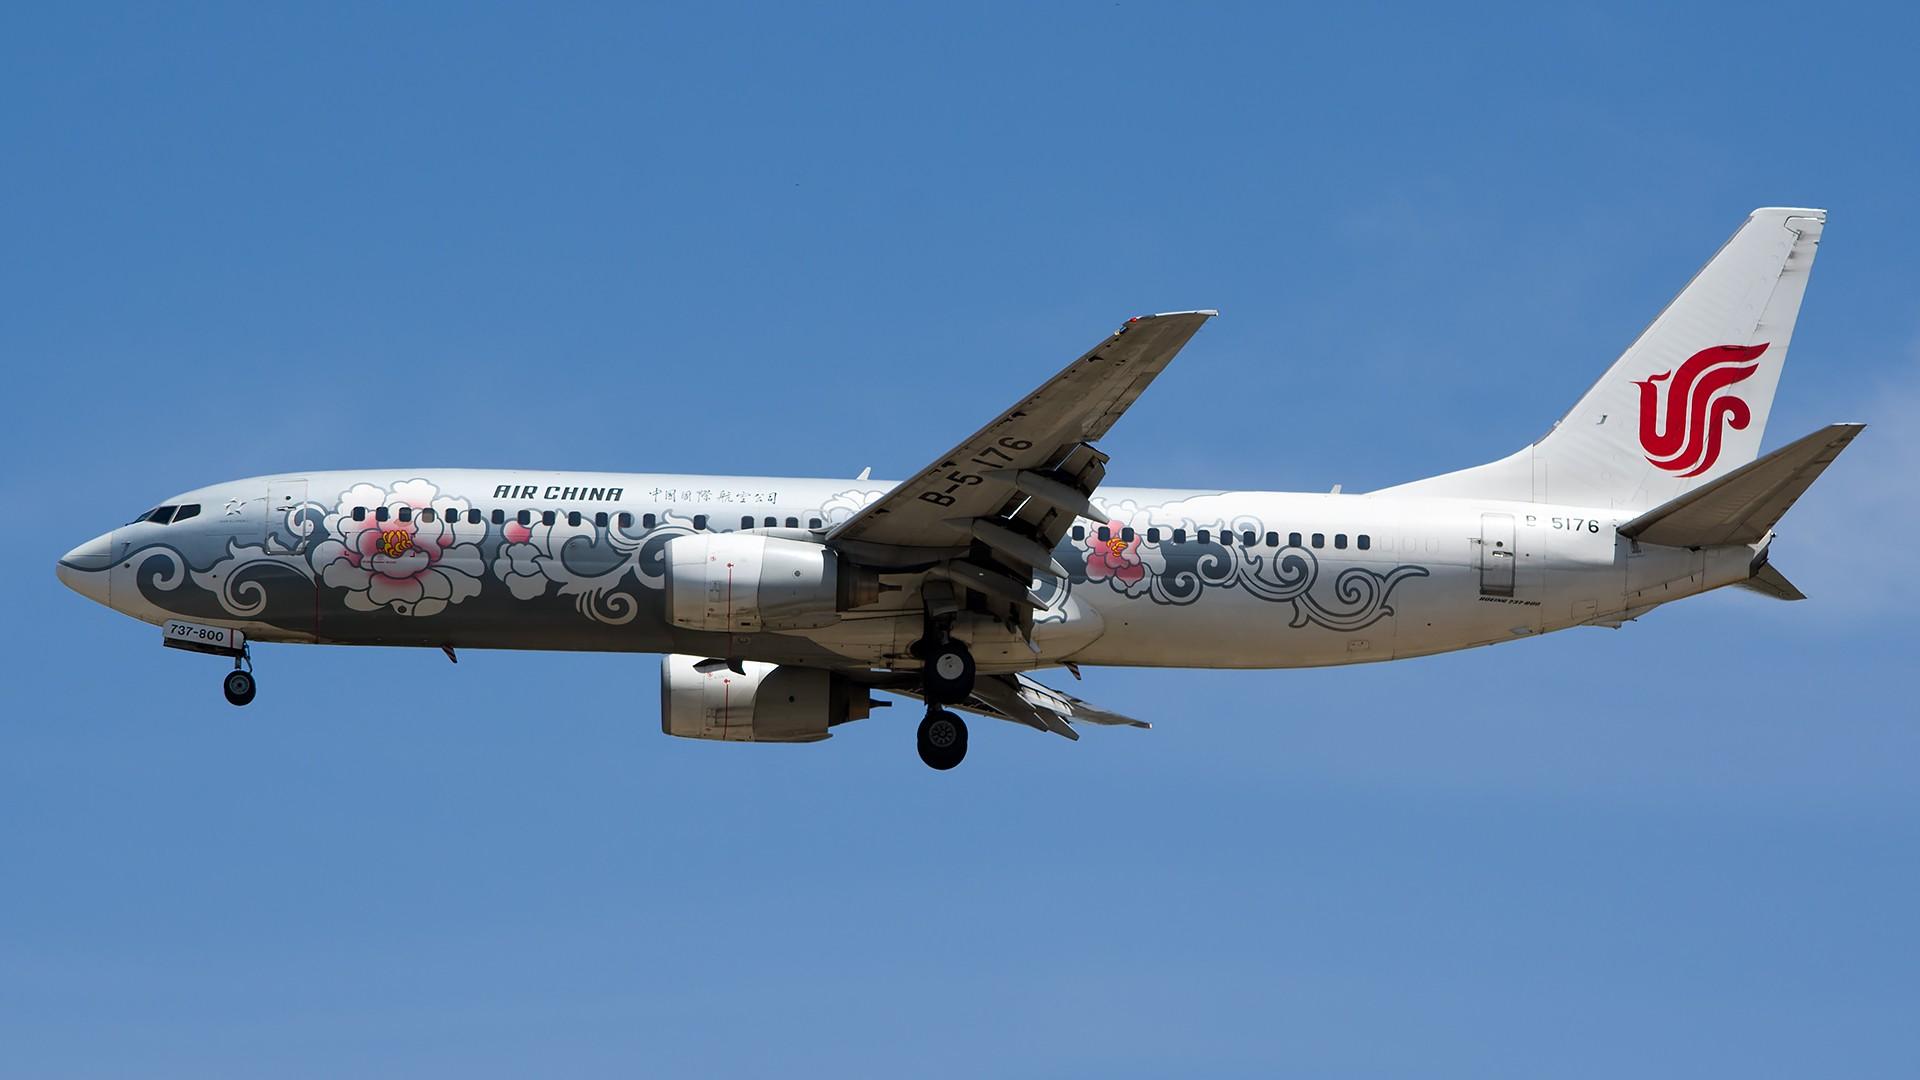 Re:[原创]PEK01午后两小时抓拍,其实是为AA的One World来的 BOEING 737-800 B-5176 中国北京首都国际机场